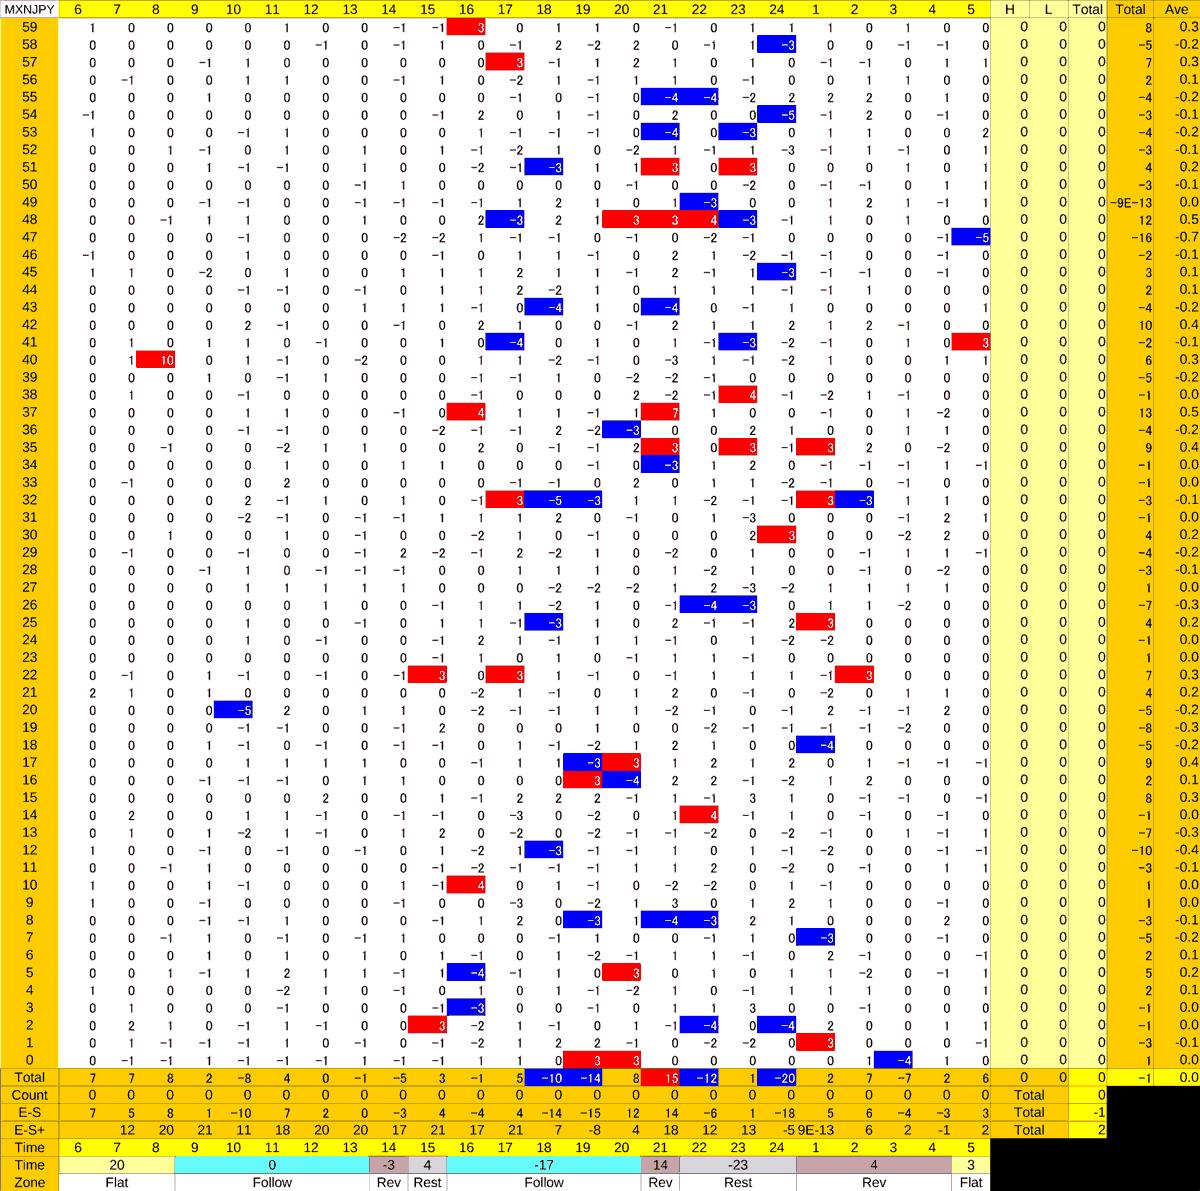 20201014_HS(3)MXNJPY